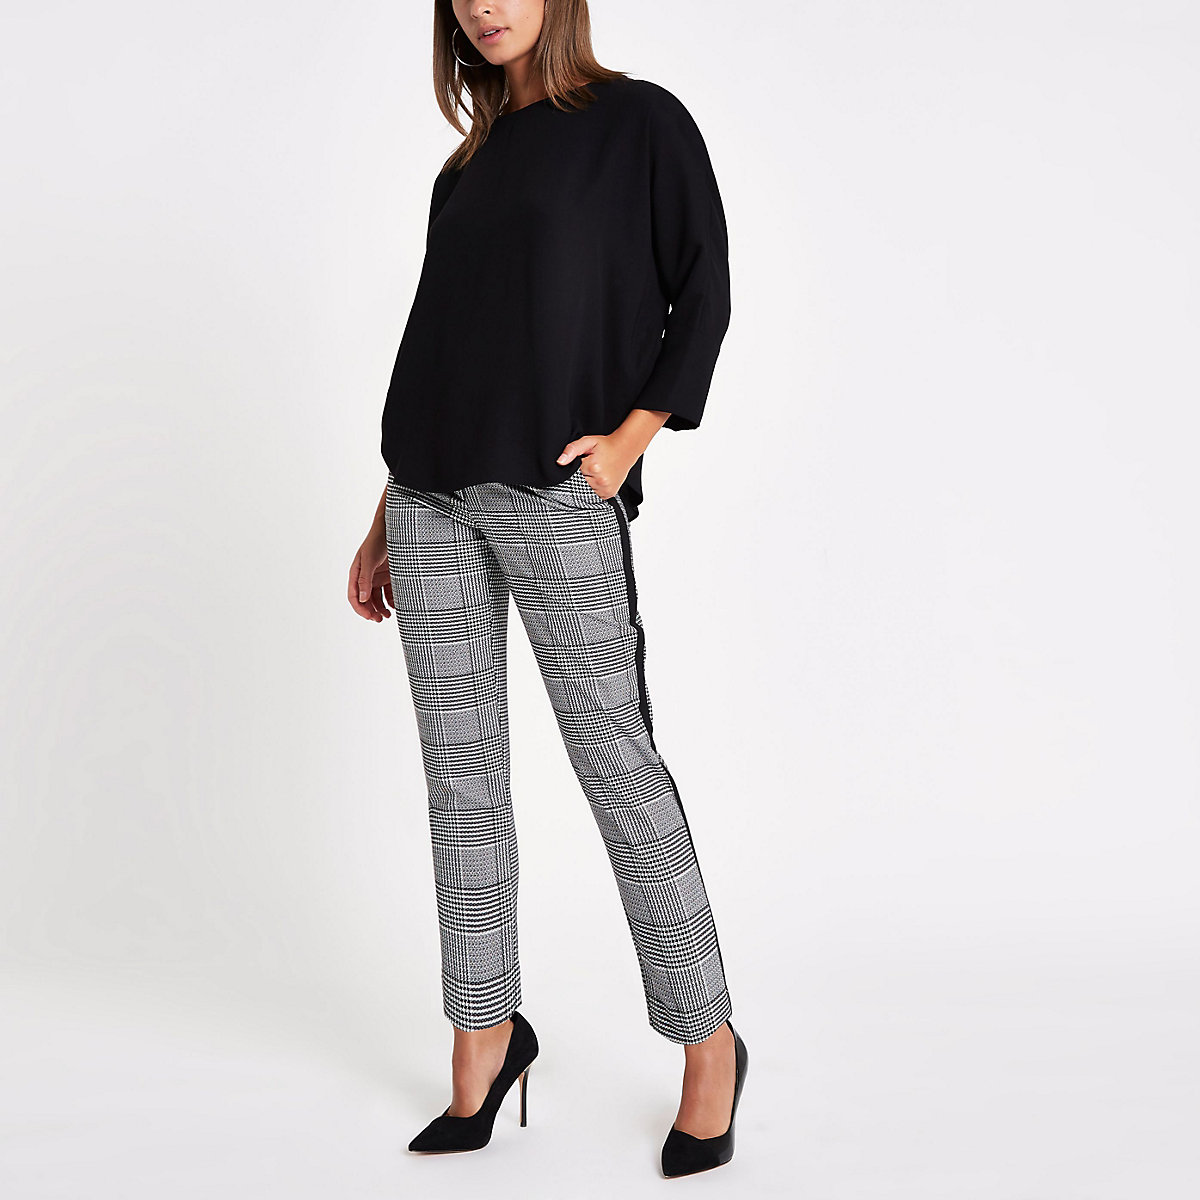 Black loose fit batwing top - Blouses - Tops - women